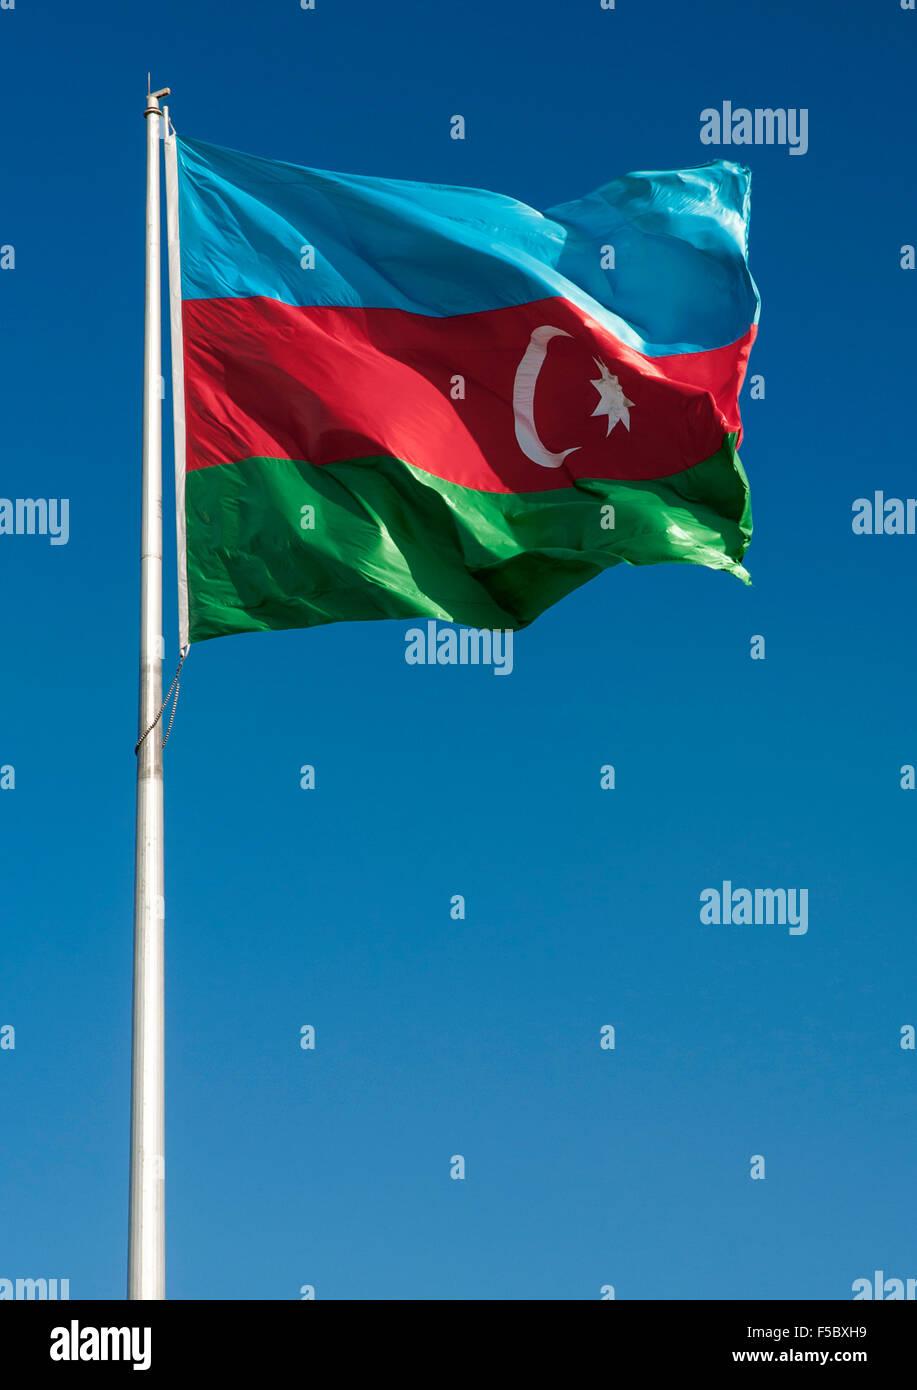 The flag of Azerbaijan. - Stock Image